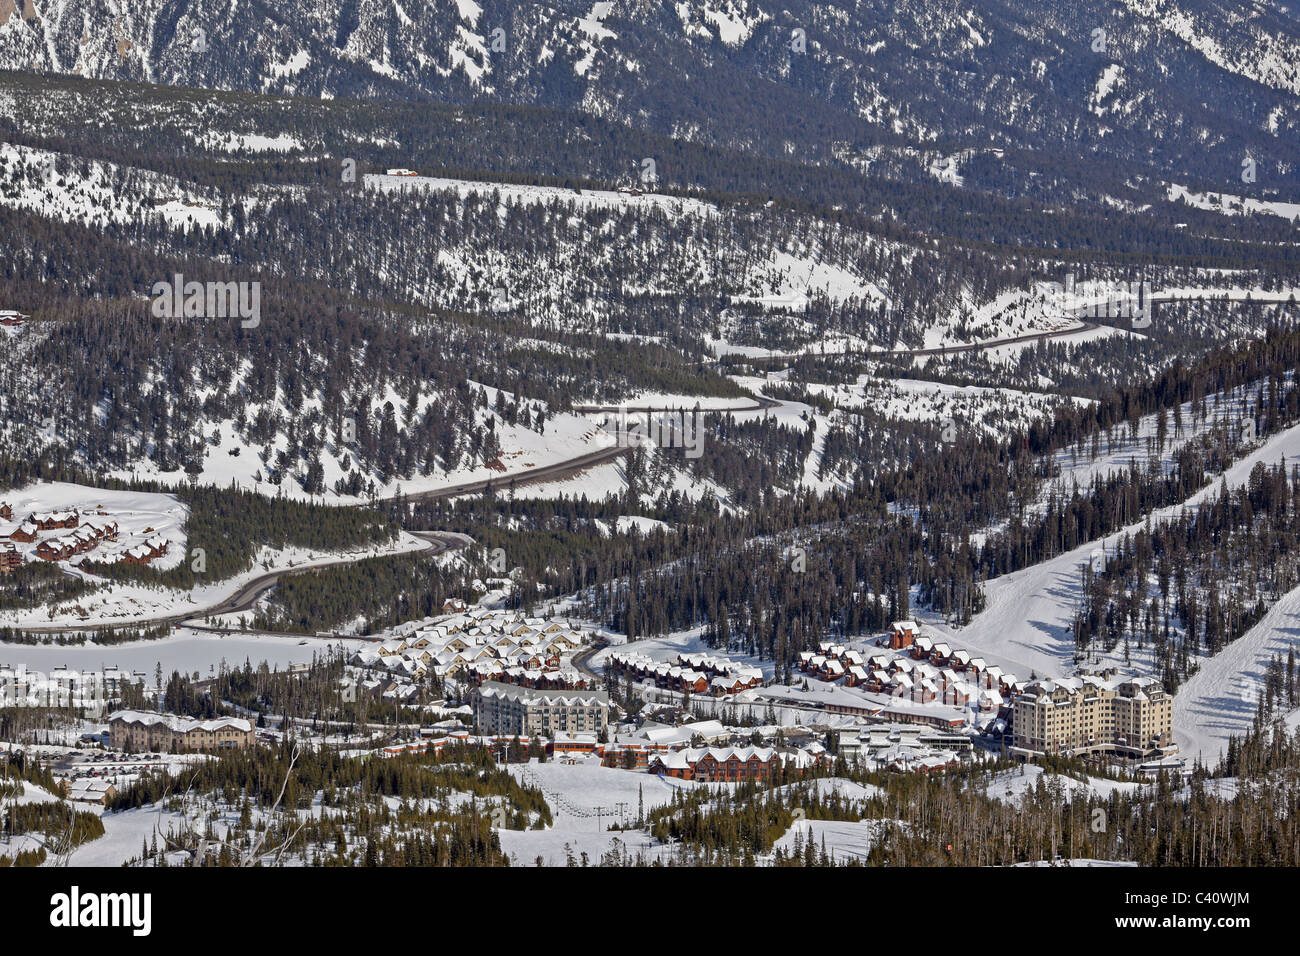 Base facilities at Big Sky Montana, one of the largest ski resorts in North America. Big Sky Montana, Montana, United - Stock Image